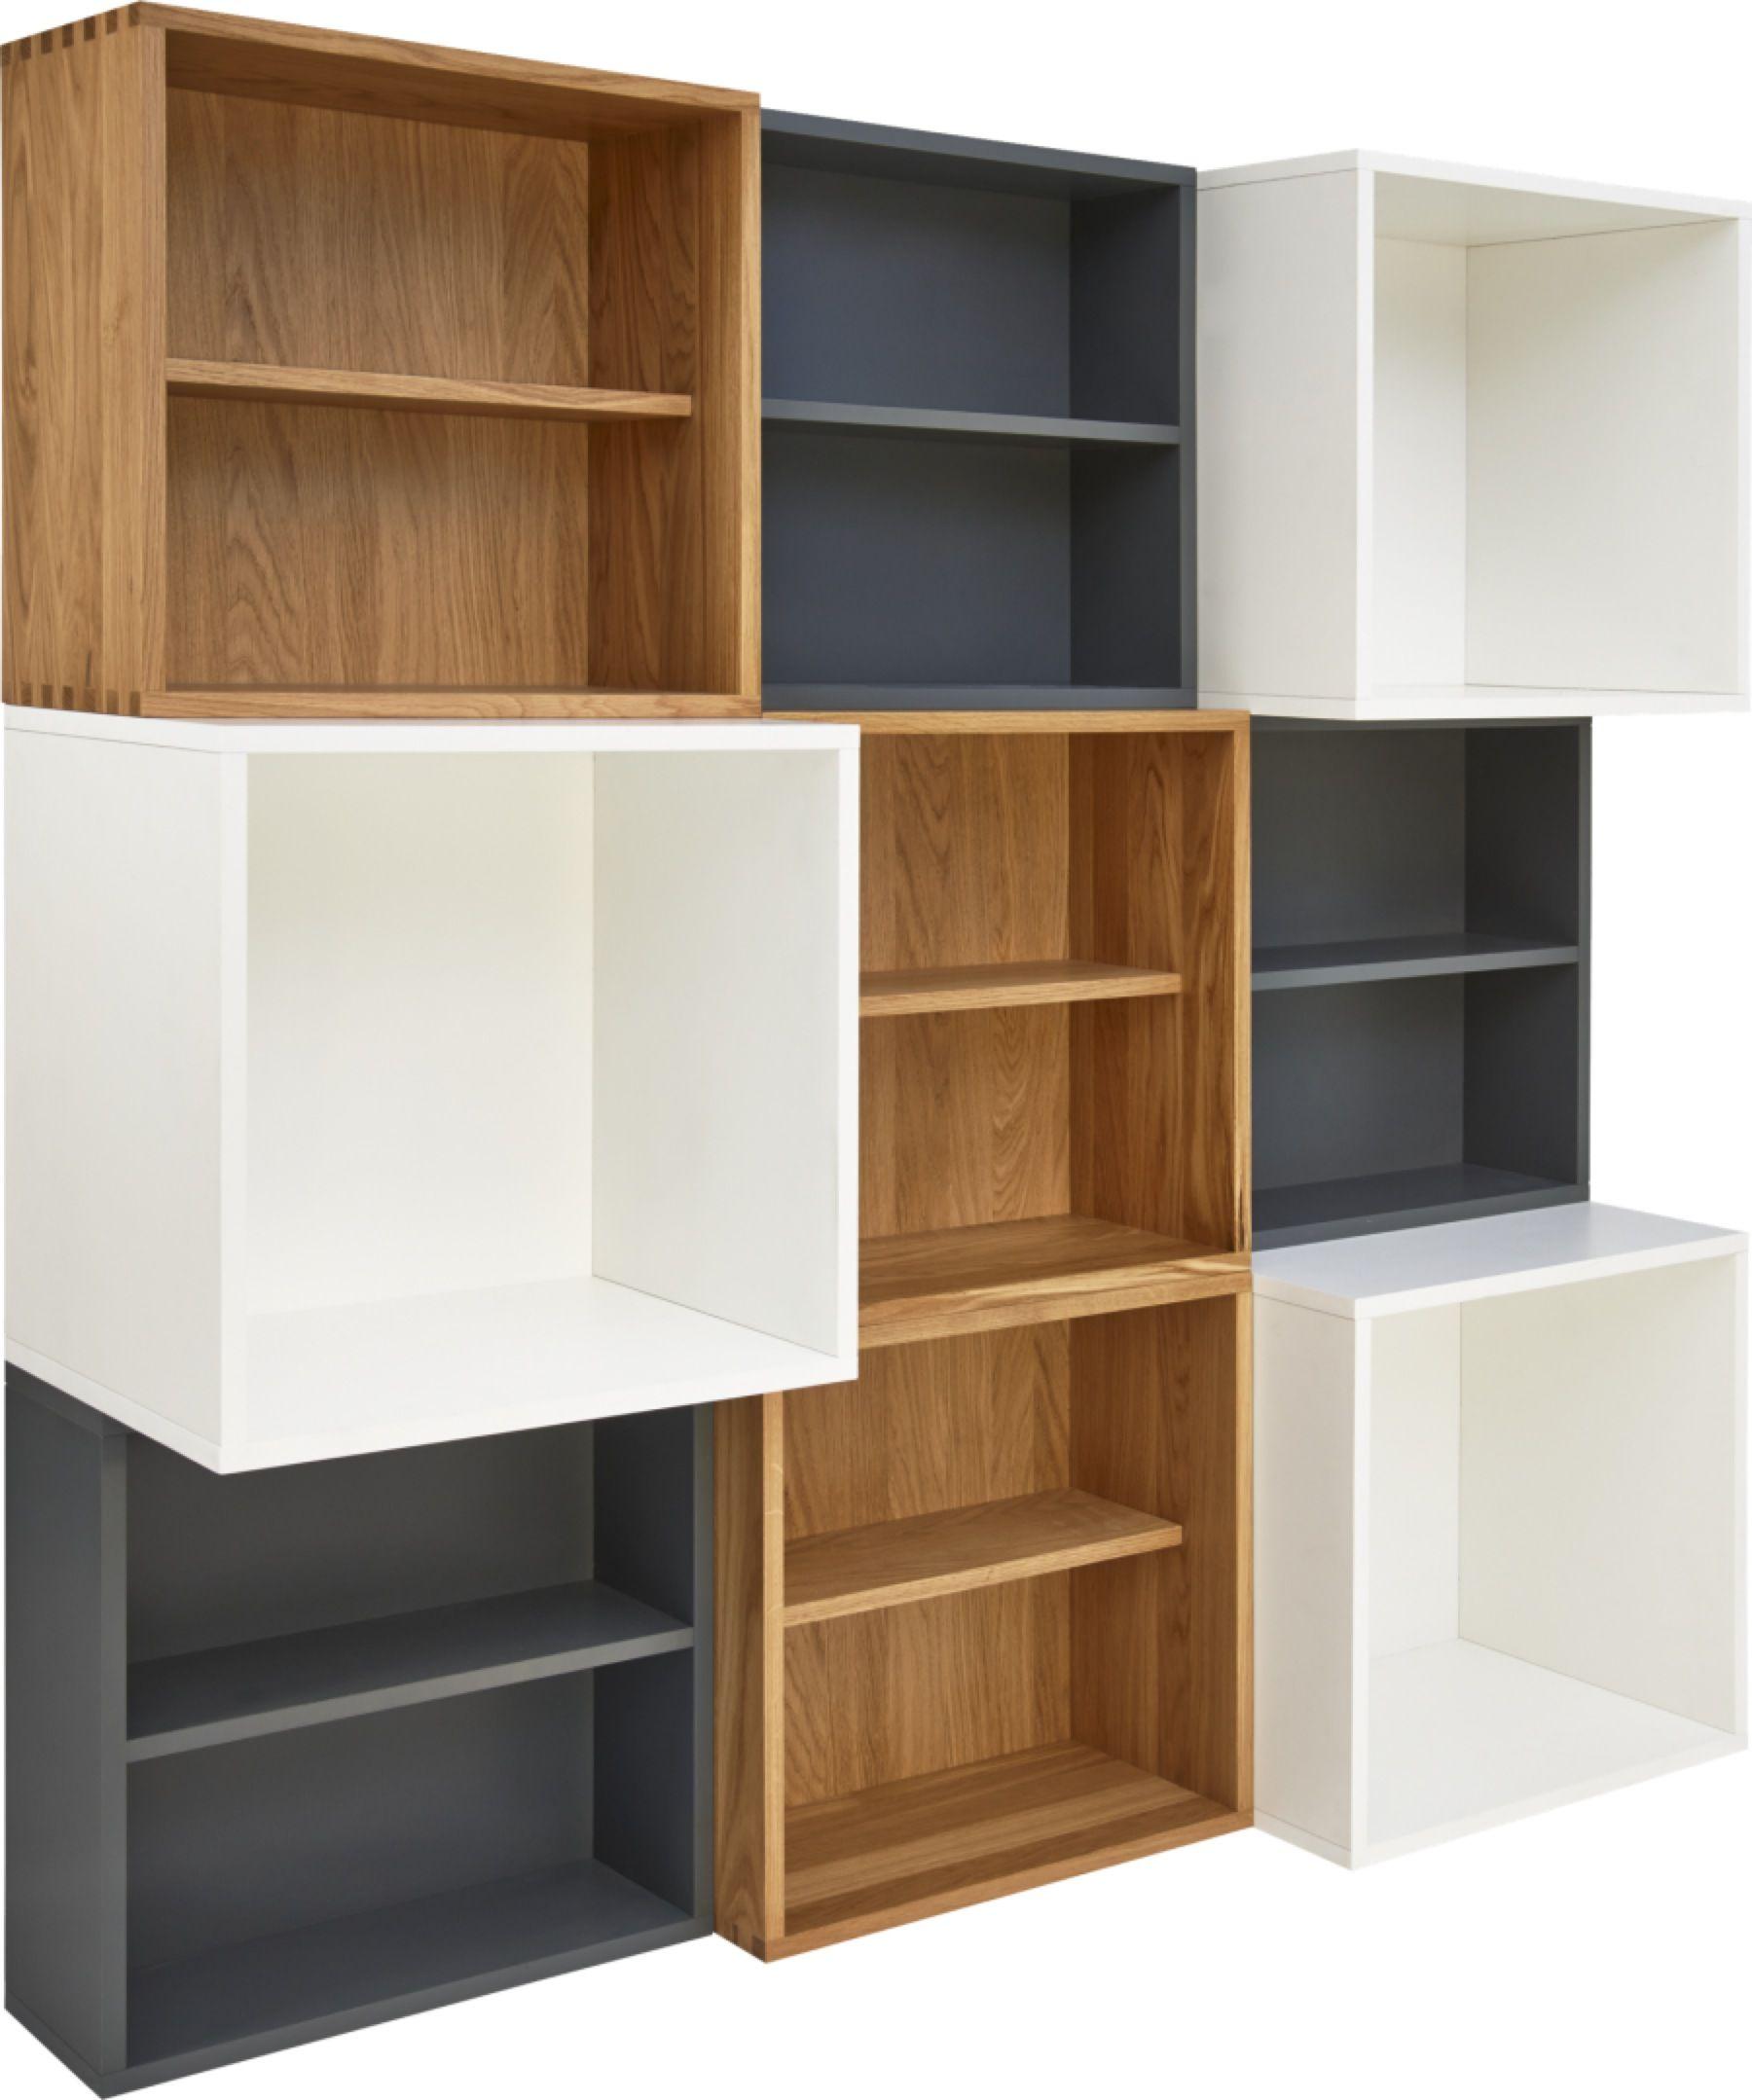 Rangement Modulaire Brick Habitat Pinterest Modulaire  # Bibliotheque Modulaire